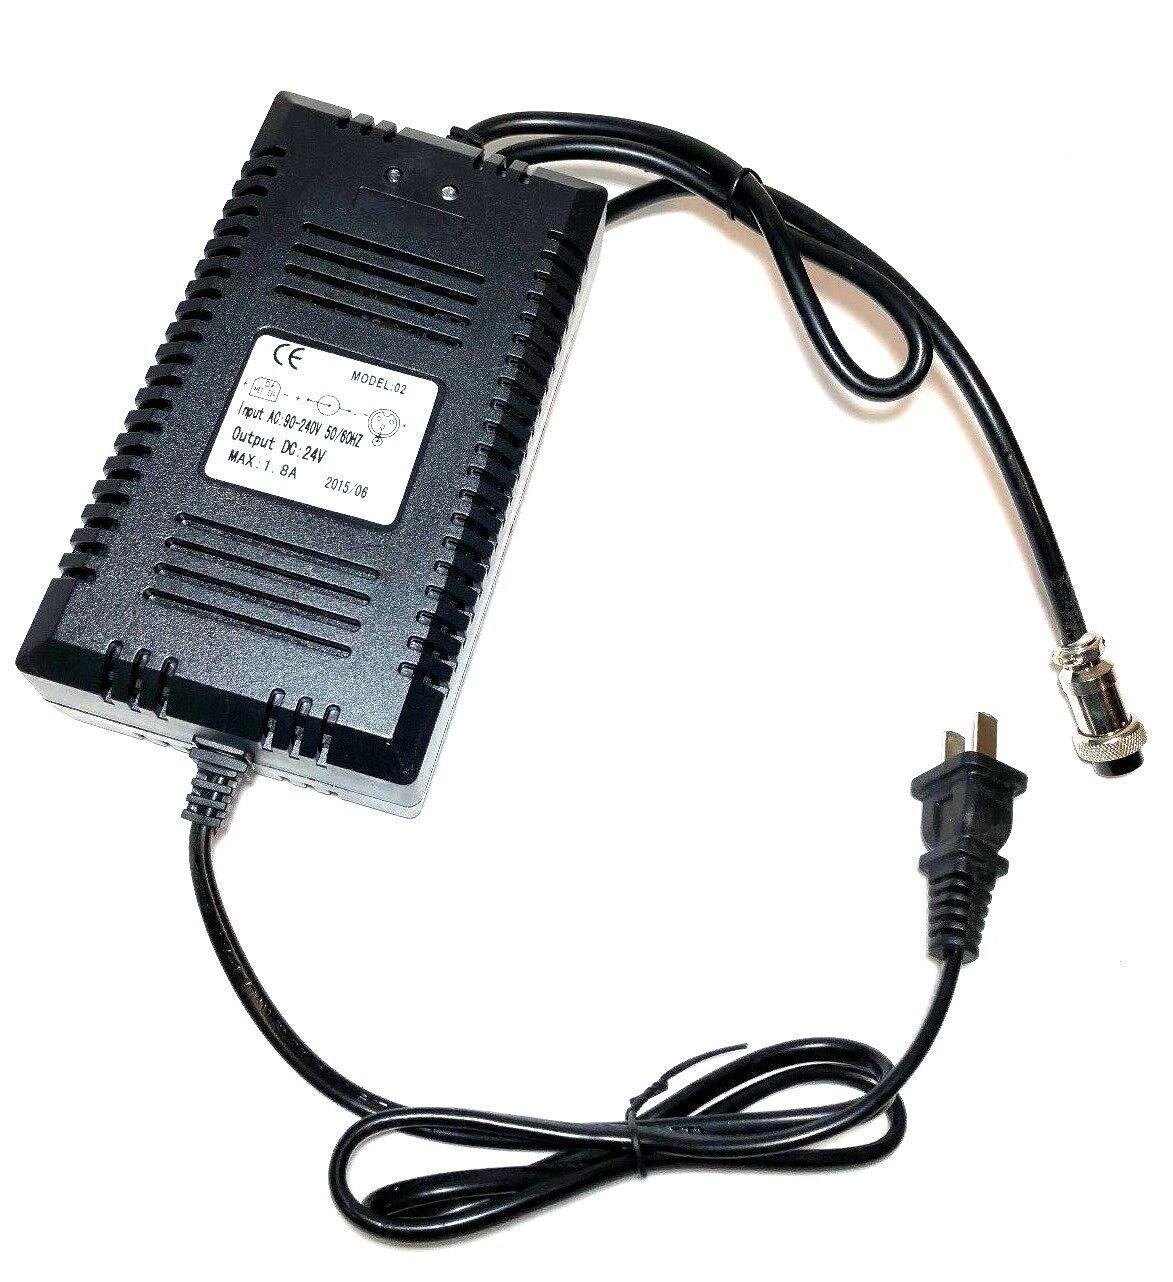 24V Battery Charger for Razor E200 E300 E500S Pocket Mod Swe